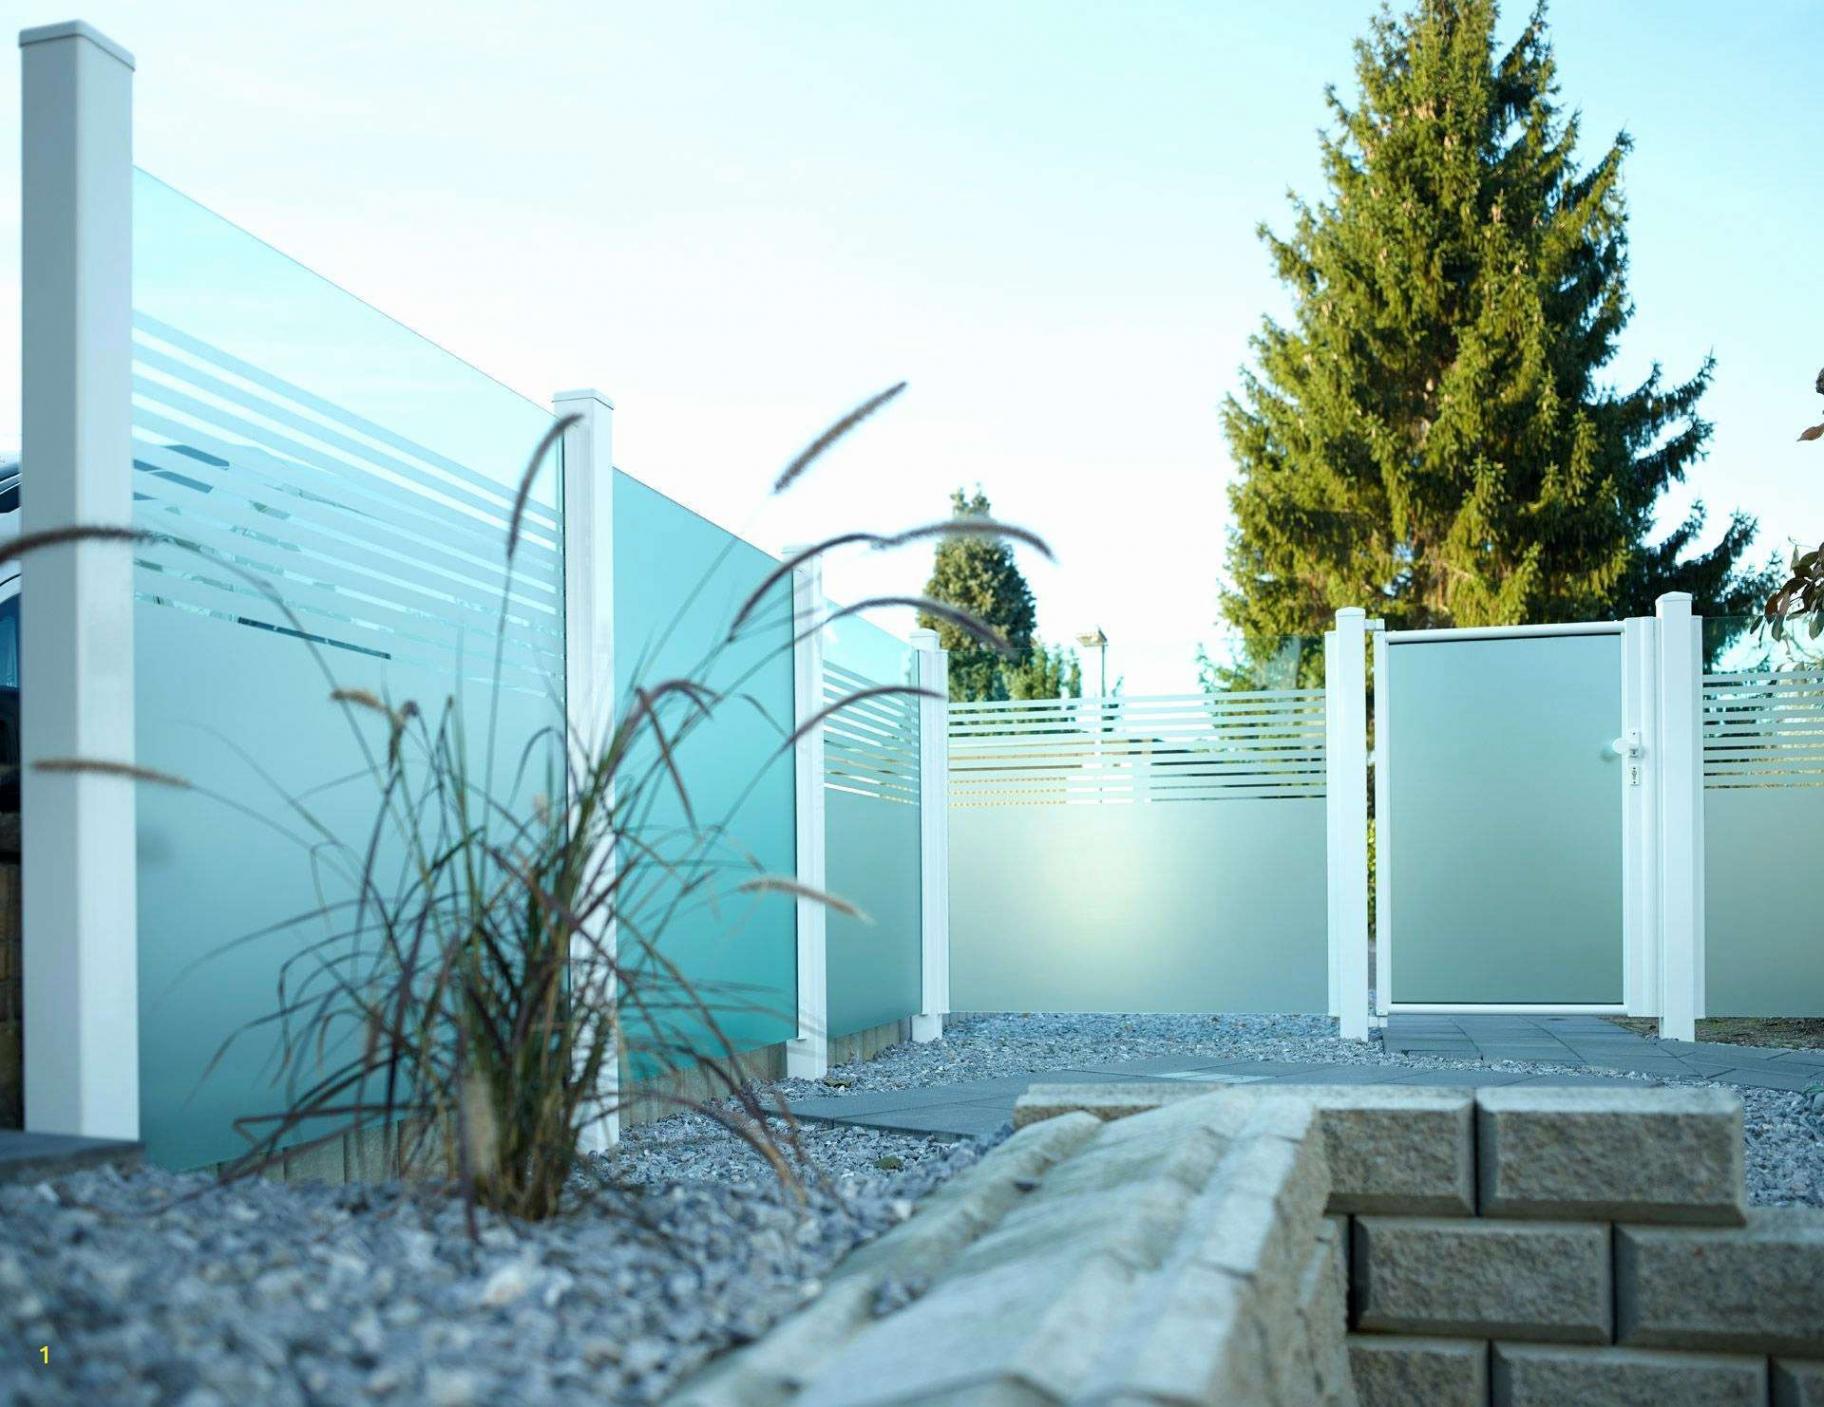 Alte Türen Als Deko Schön Ideen Mit Alten Türen — Temobardz Home Blog